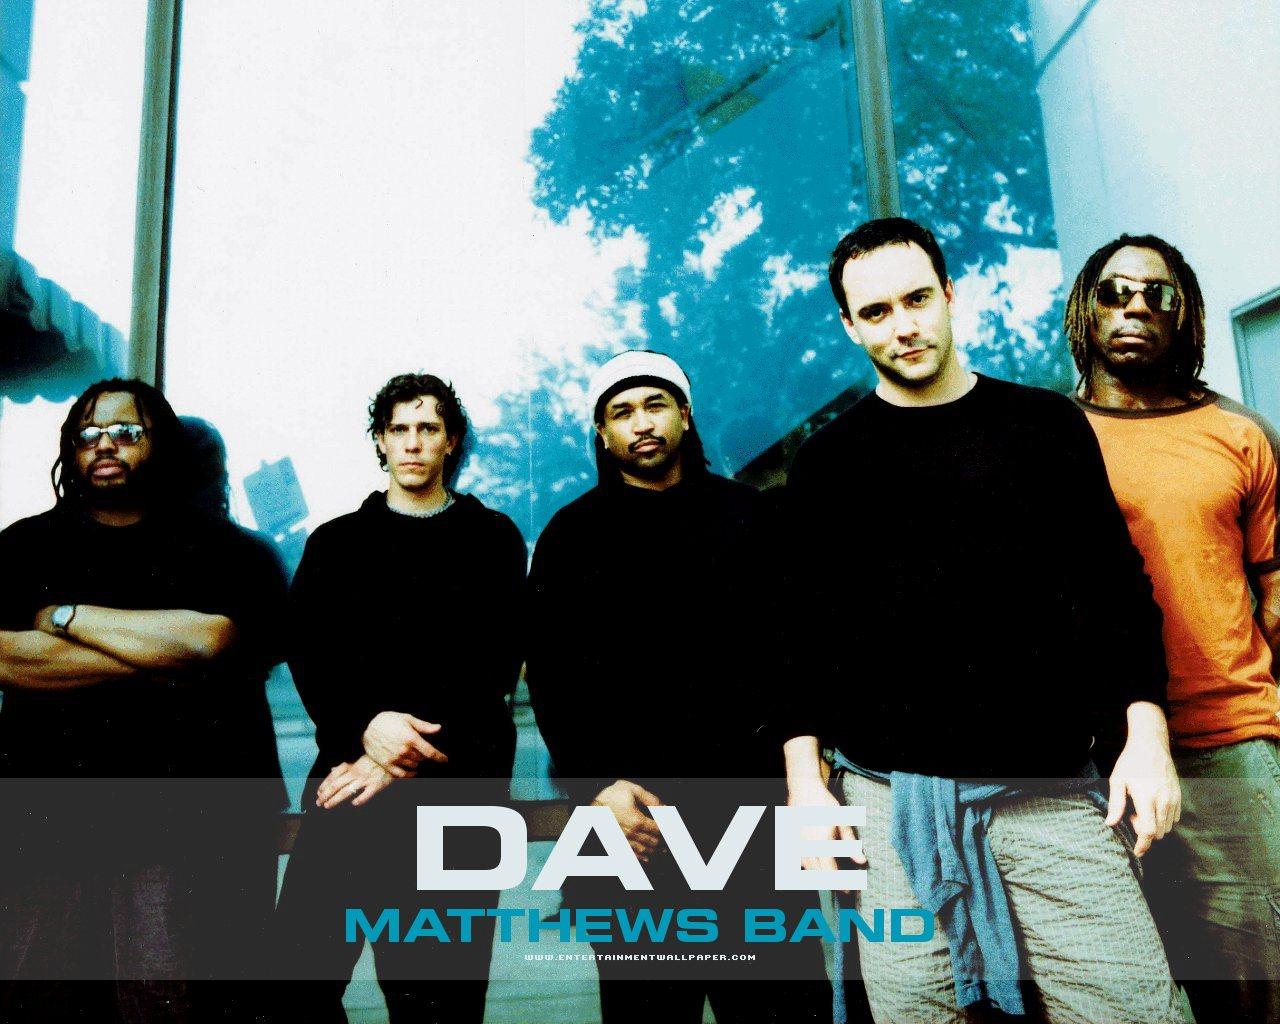 Dave Matthews Band July 21st